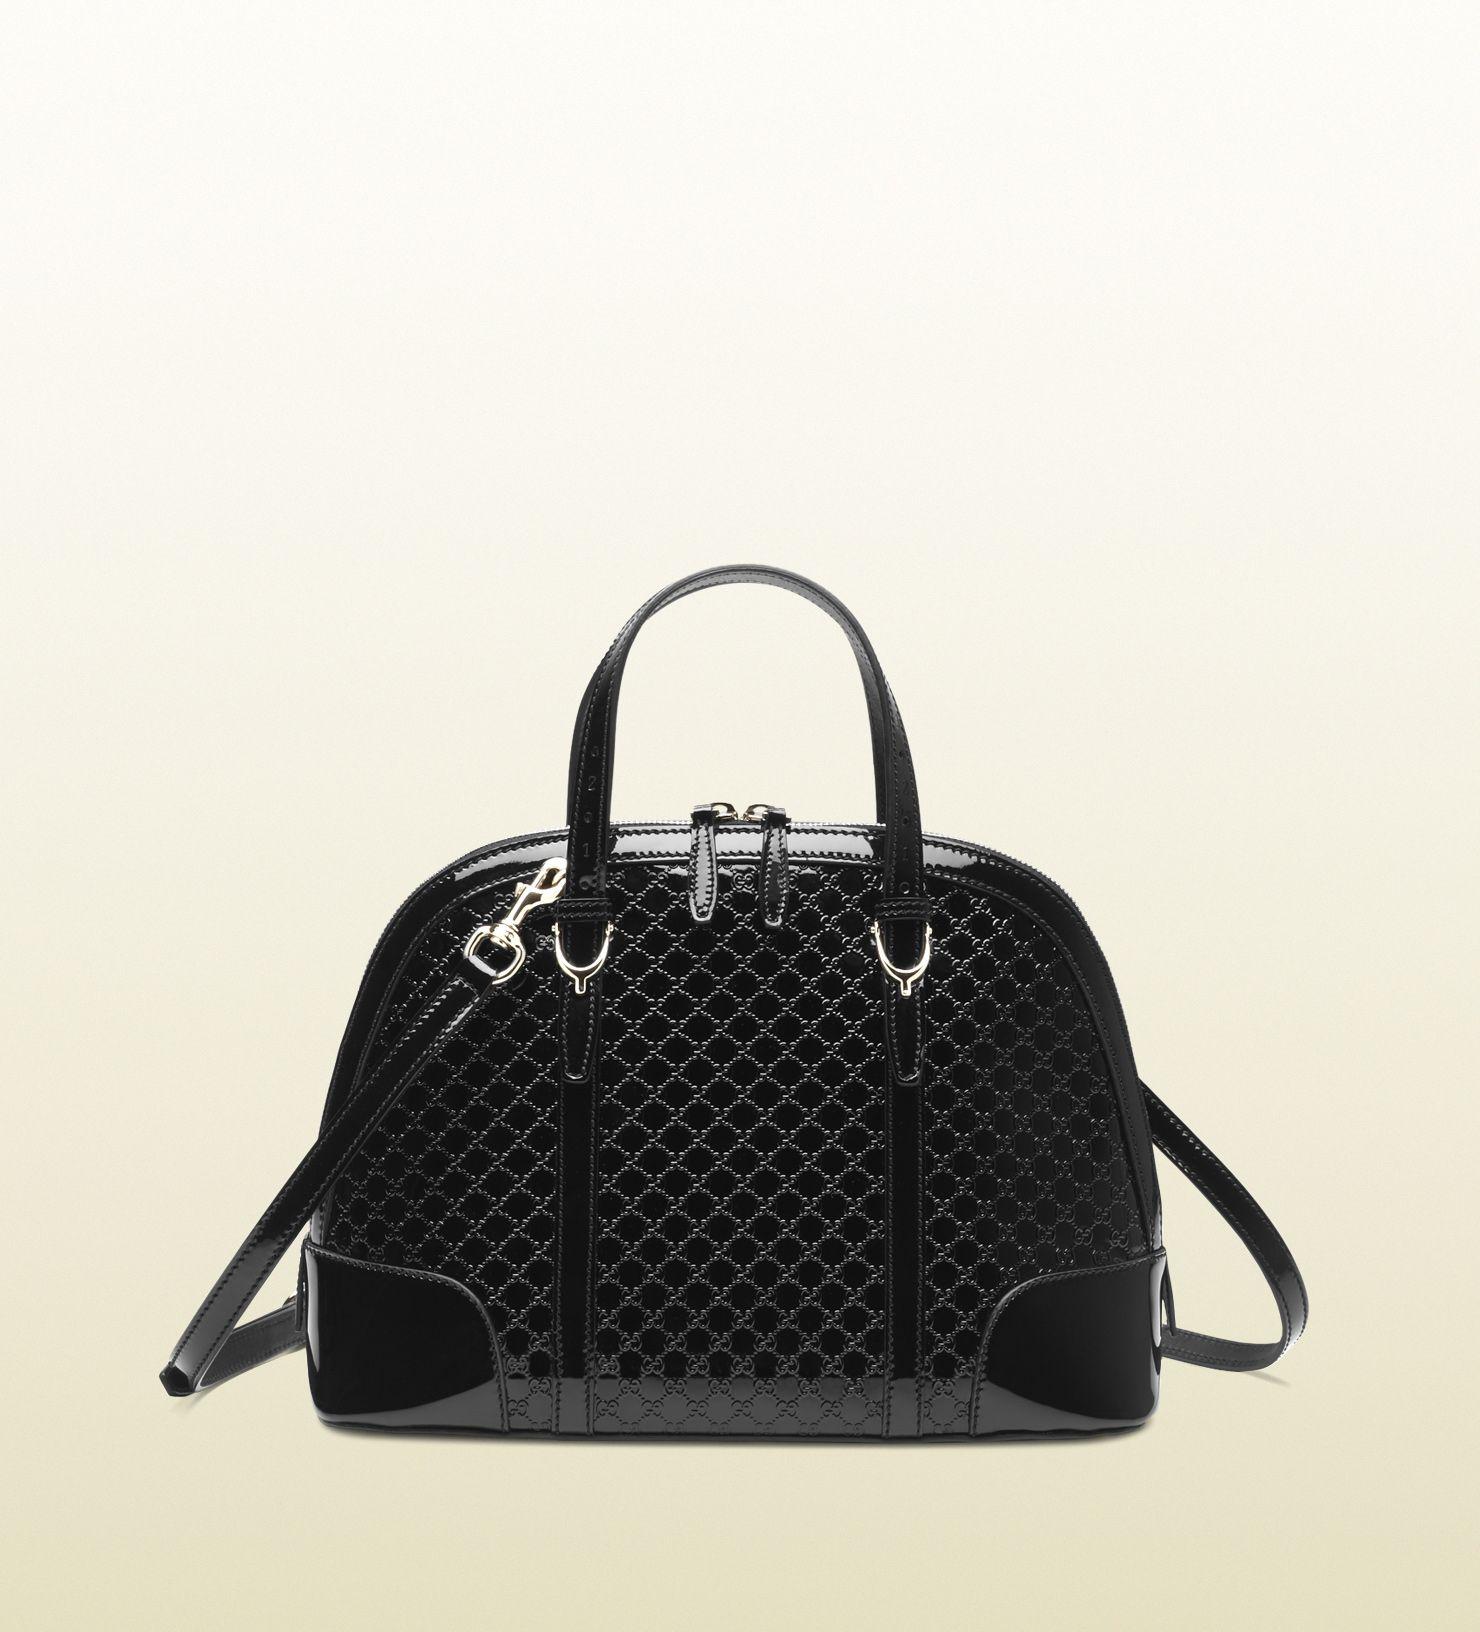 00e18b65f43 gucci nice microguccissima leather top handle bag